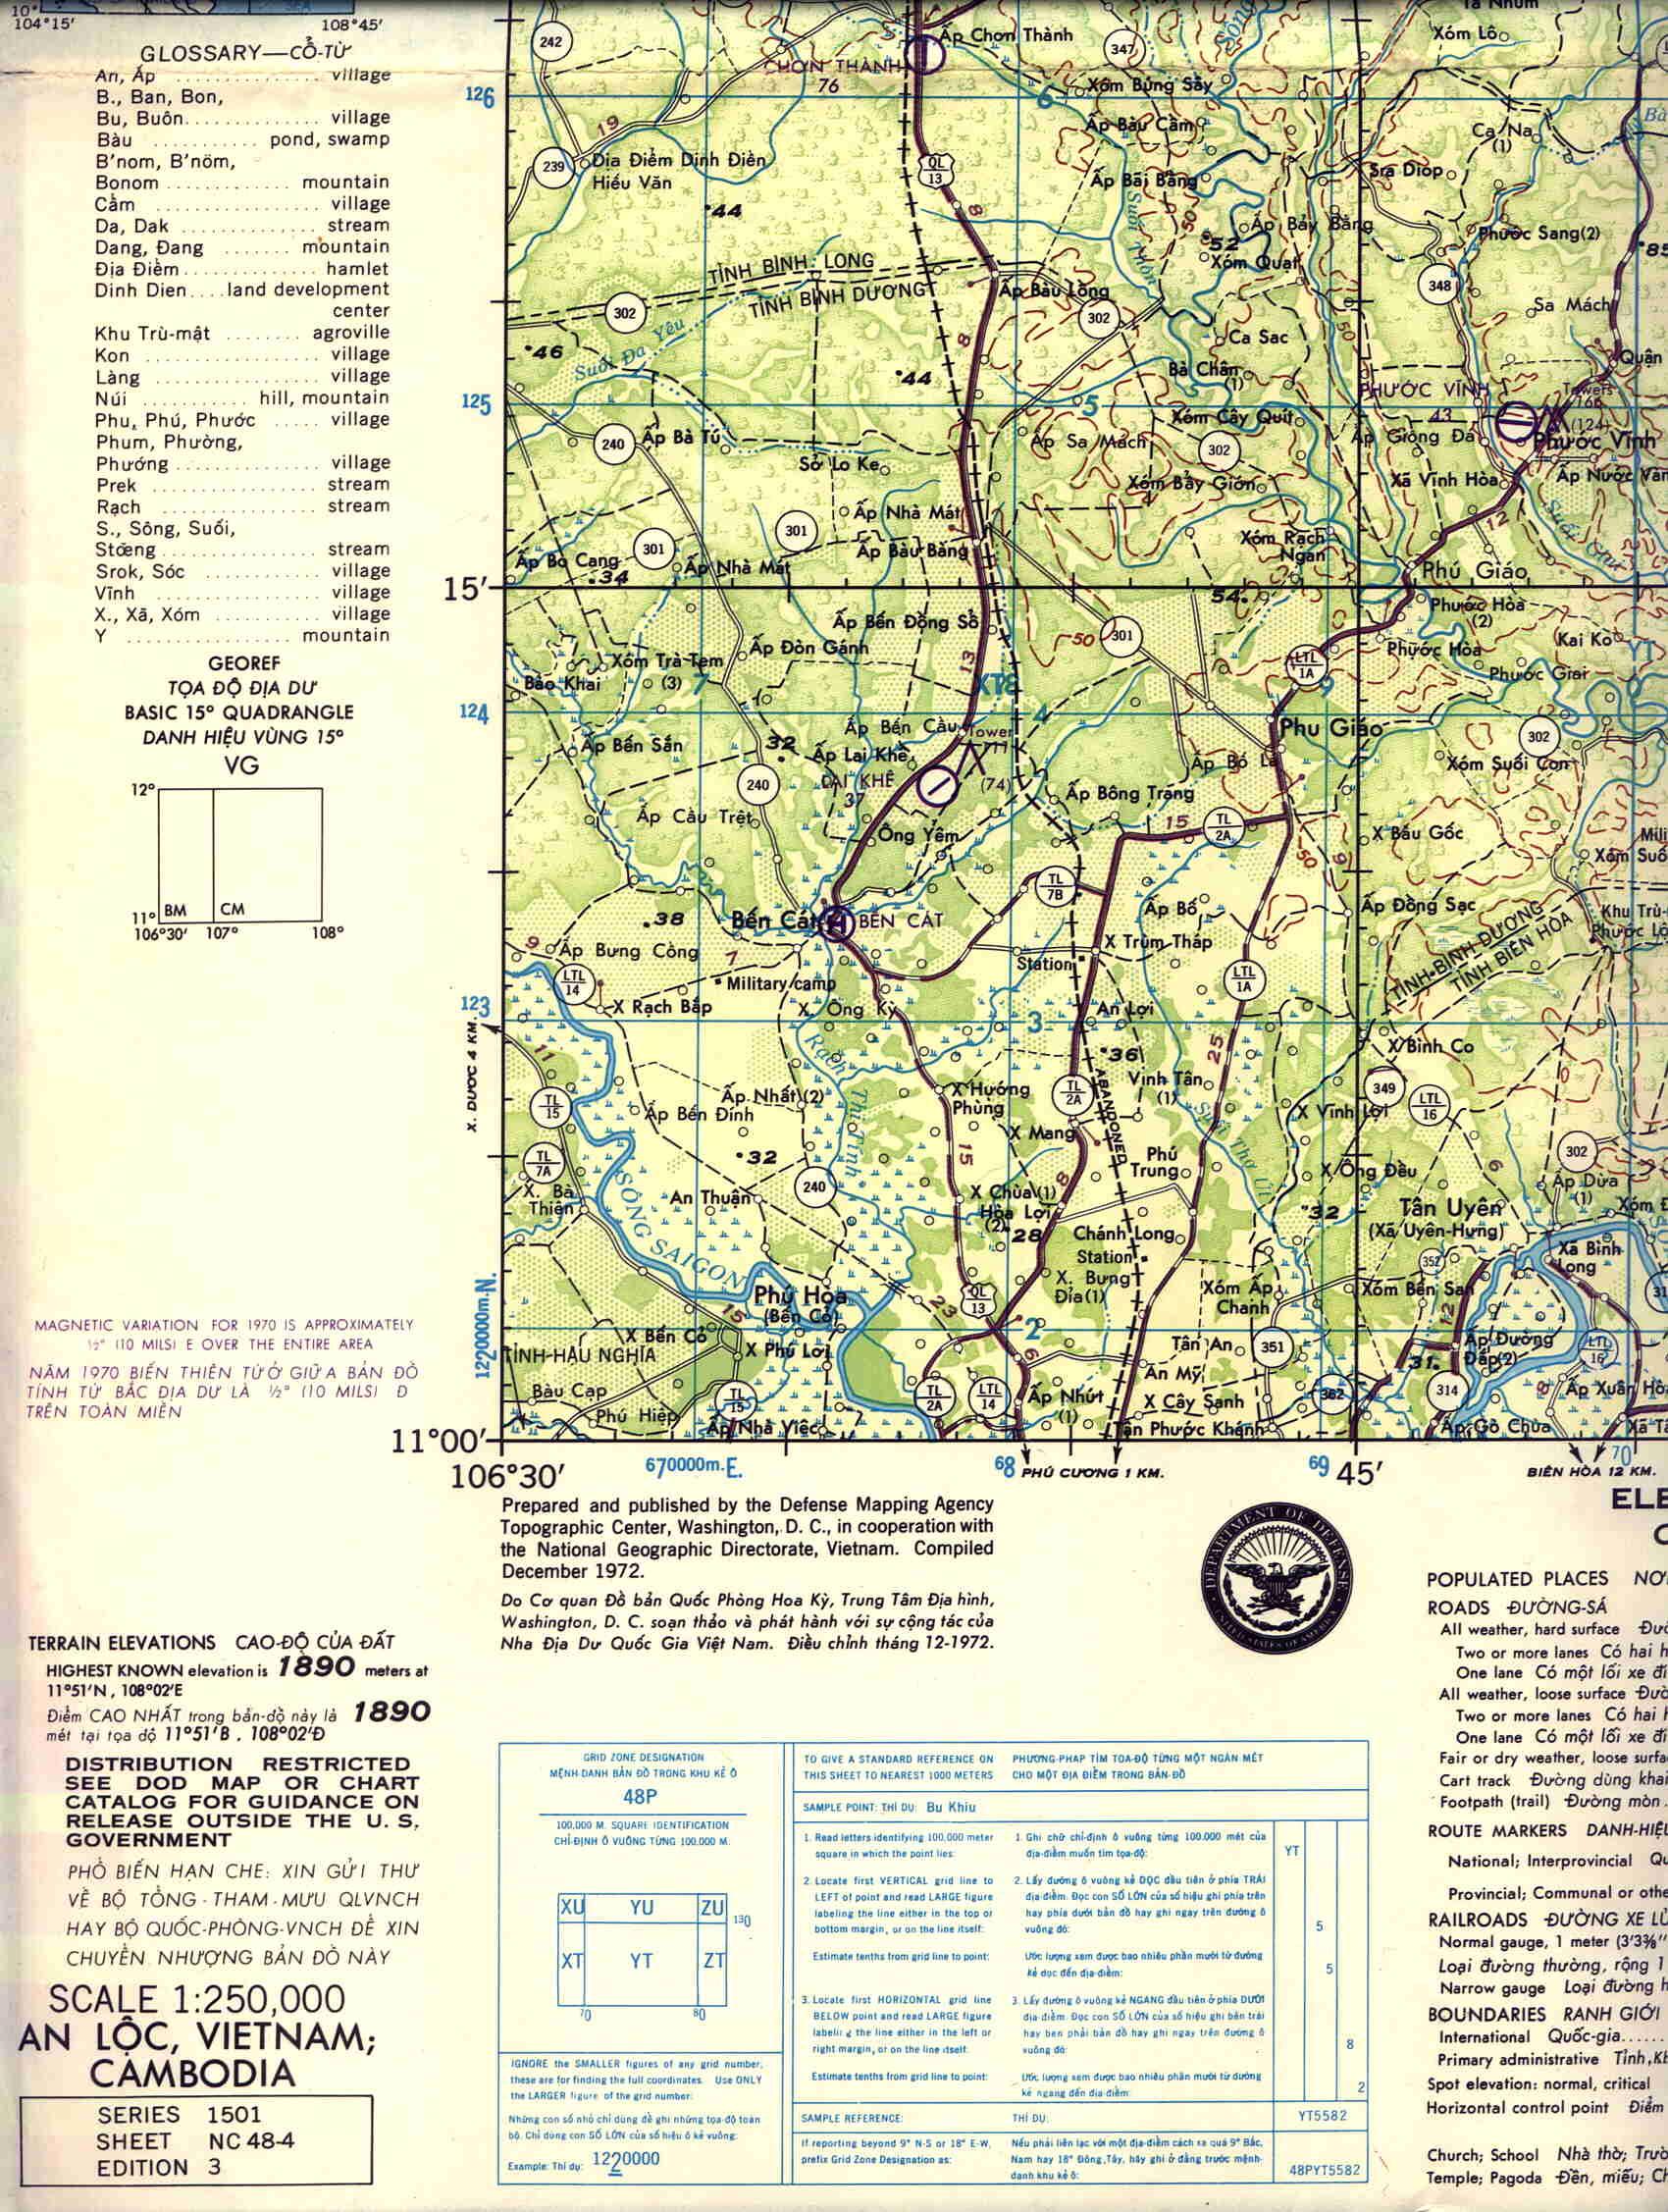 Lai Khe Vietnam Map.The 19th Tass